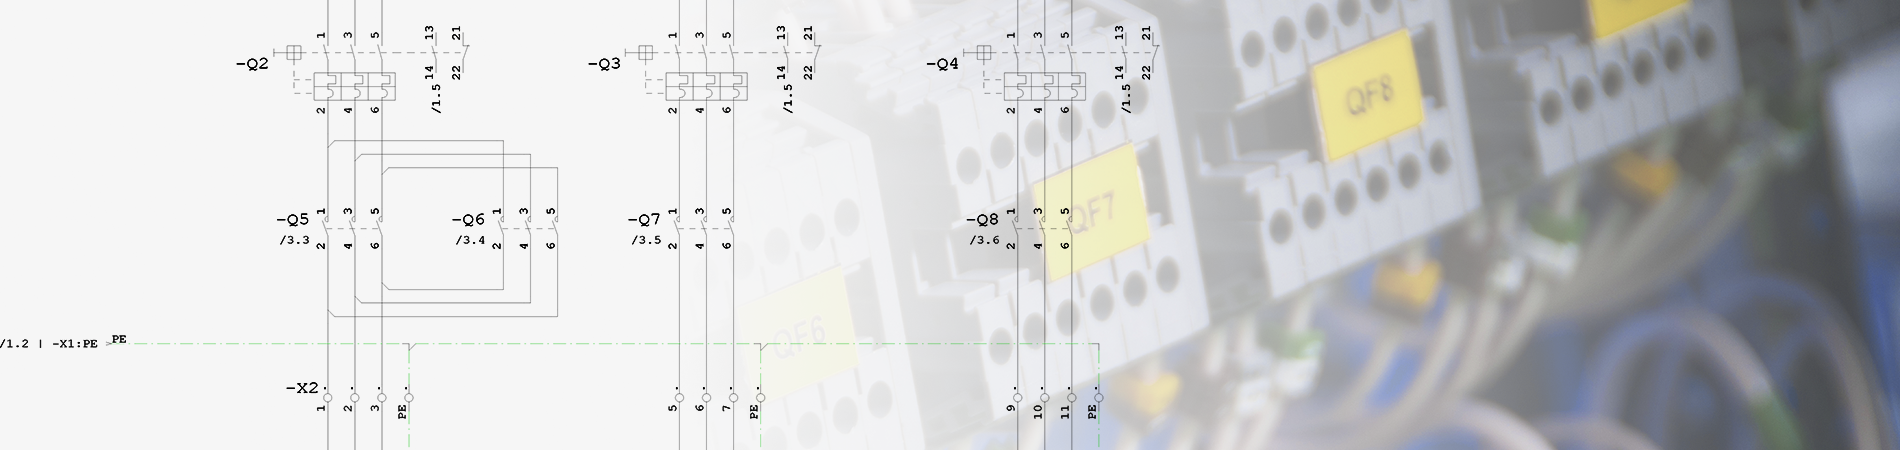 Electrical Engineering Wscad Plan